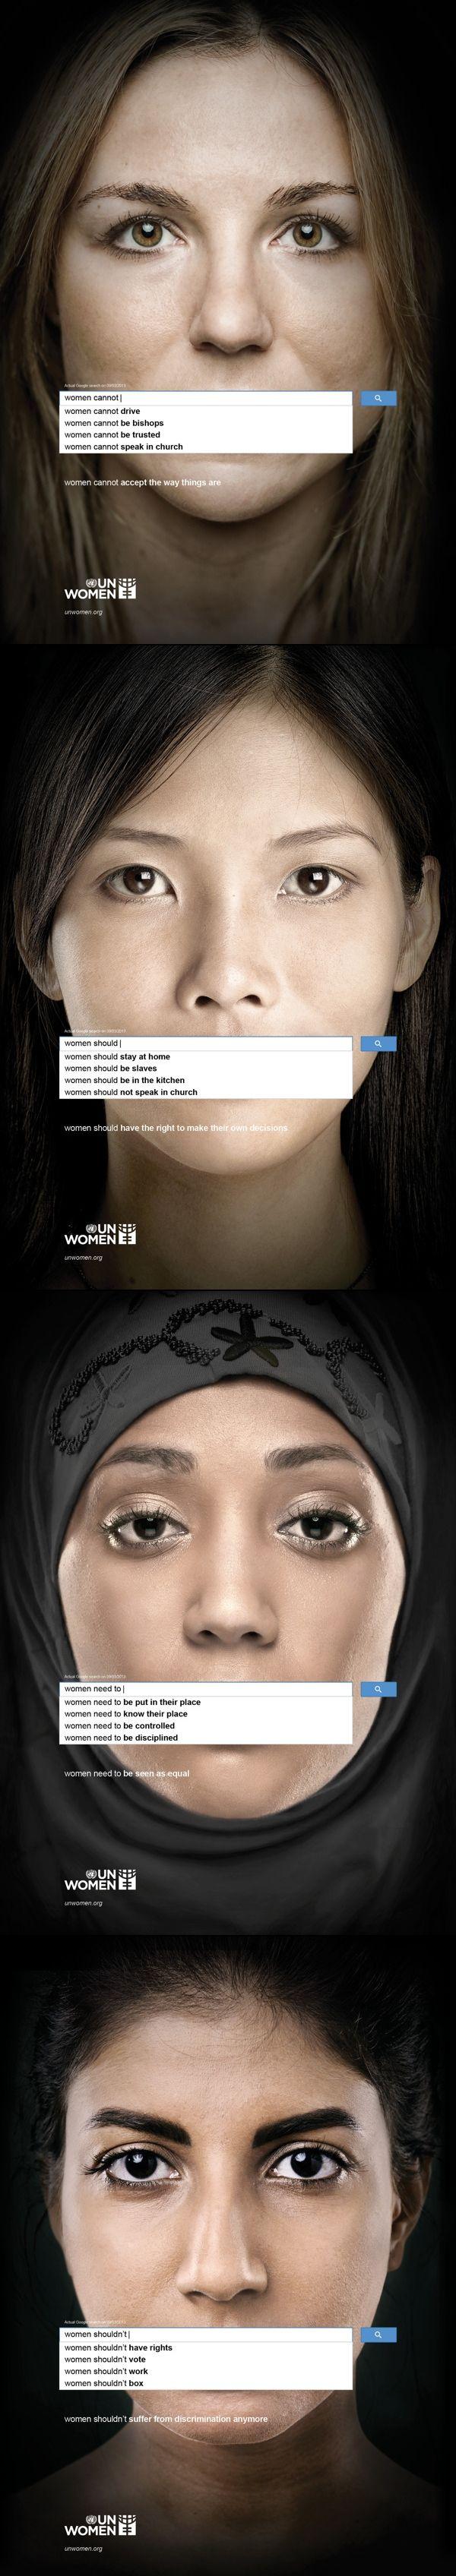 UN WOMEN | Auto Complete Truth | Advertising